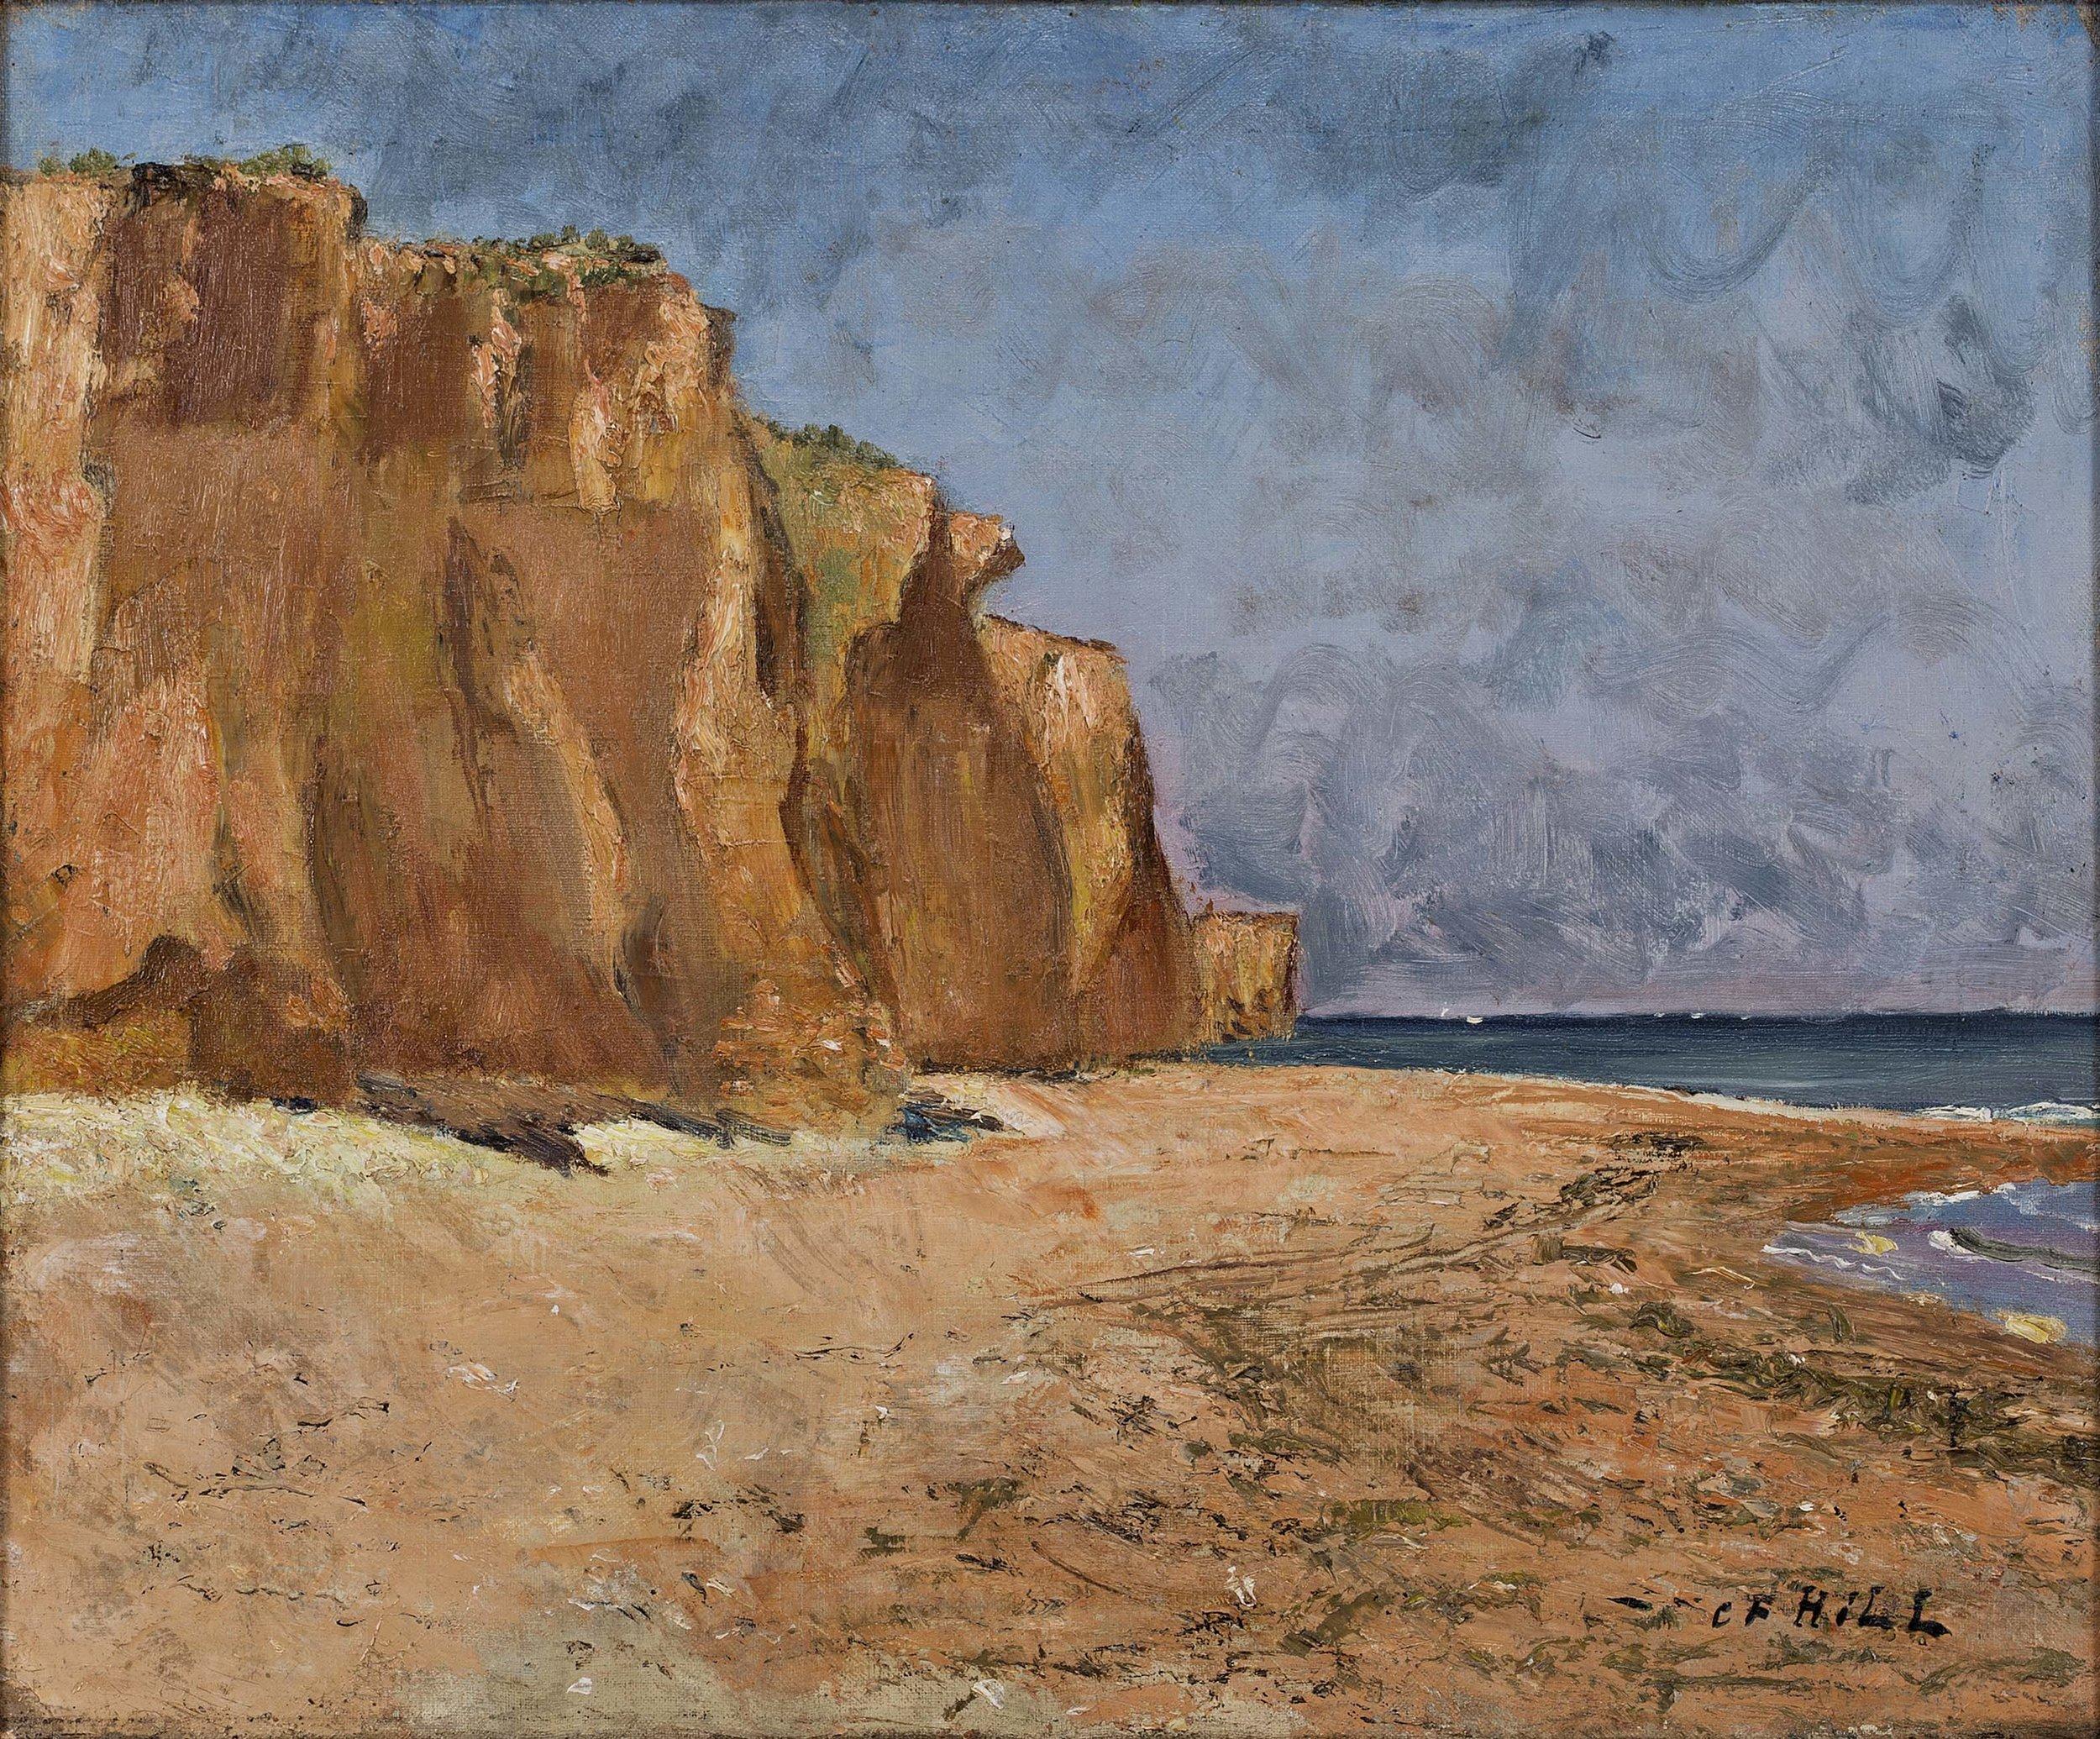 Carl Fredrik Hill   Motiv från Luc (Röda falaiser)  1876 Oil on canvas 46 x 56 cm